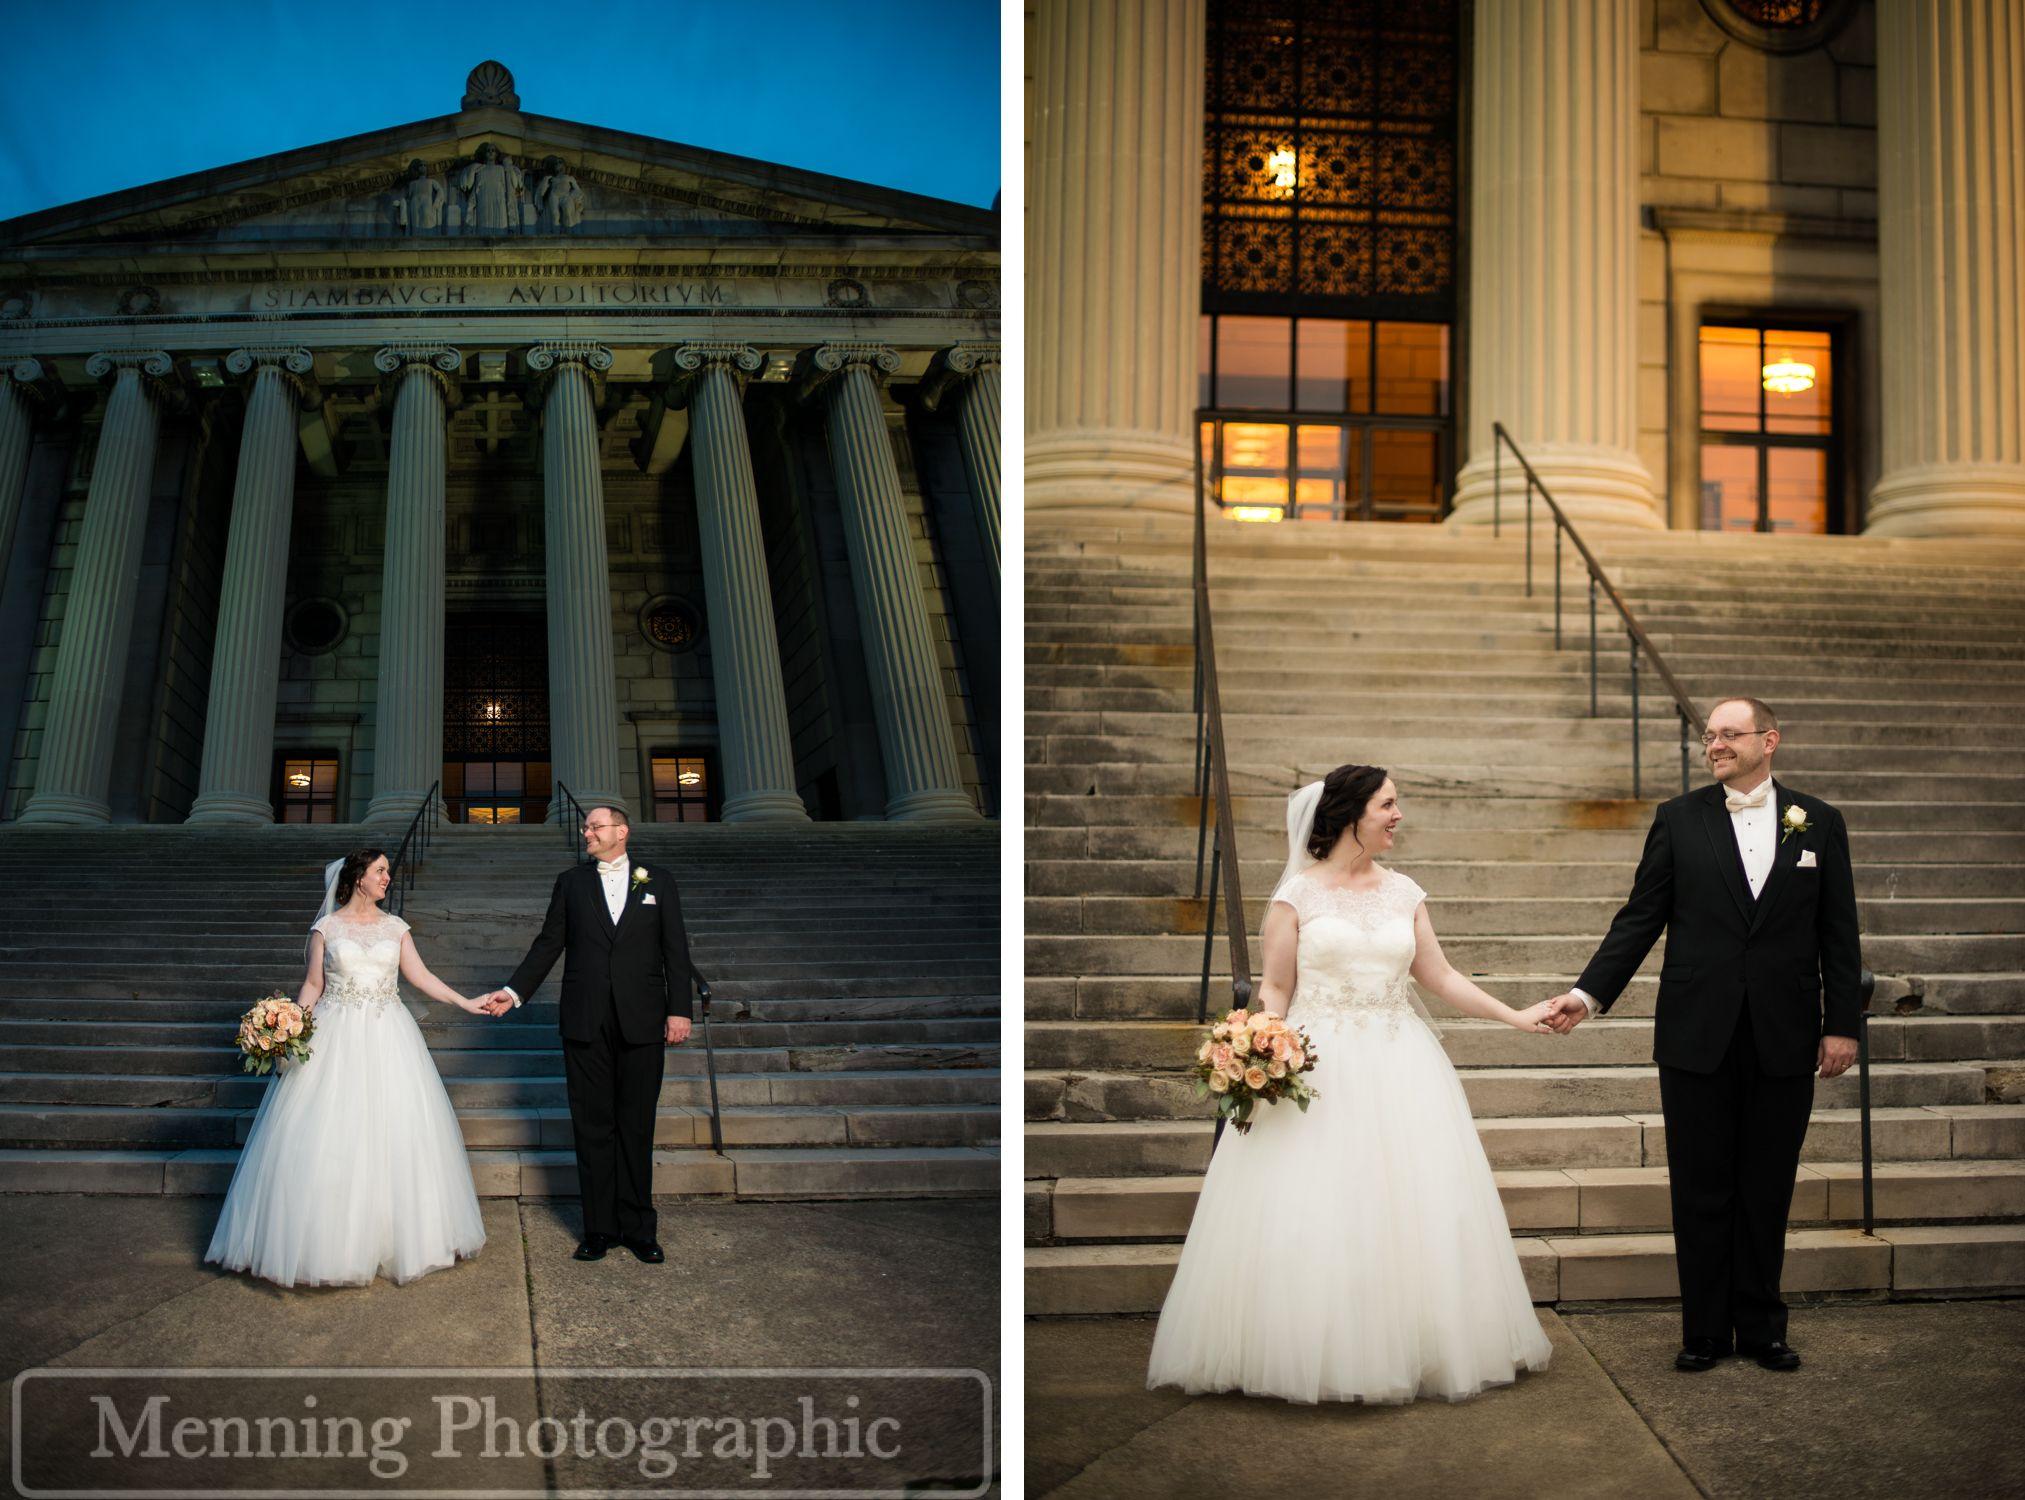 Jennifer & Chris Ohio wedding venues, Wedding